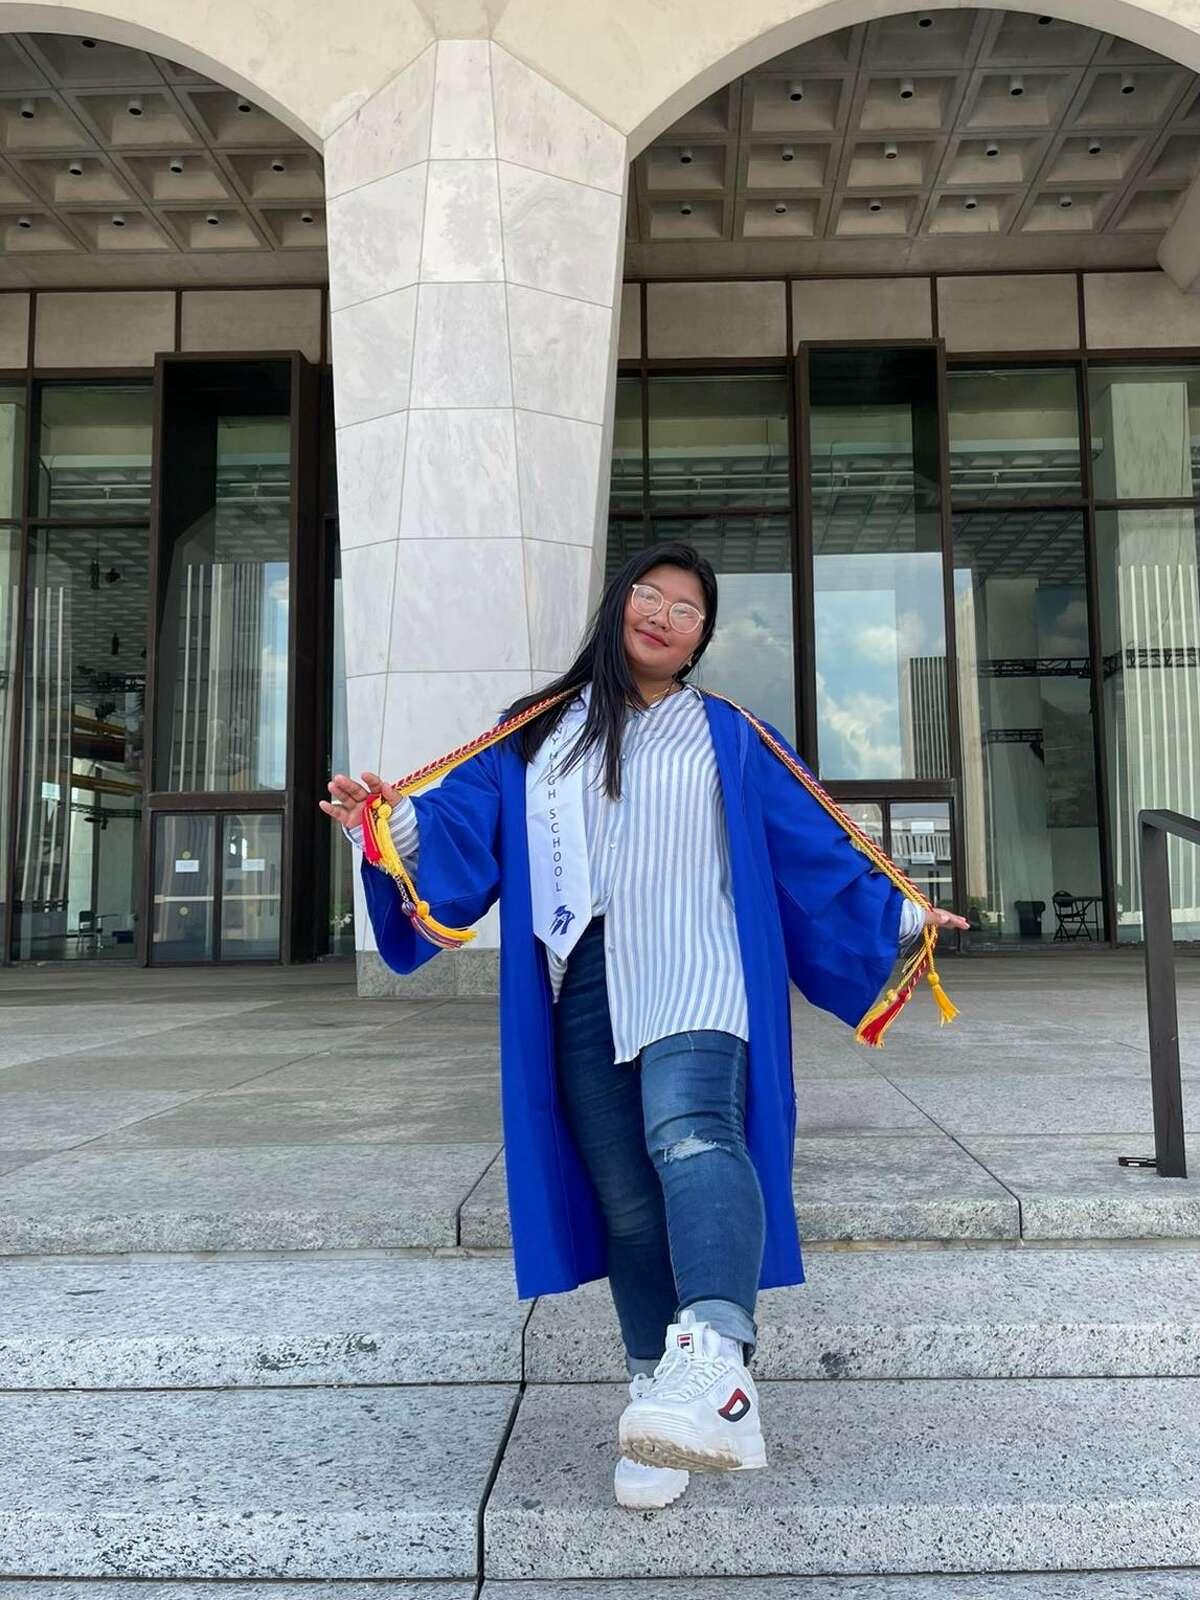 Myanoe Aung on the dayof her Albany High School graduation ceremony in June 2021. (Photo courtesy of Myanoe Aung)